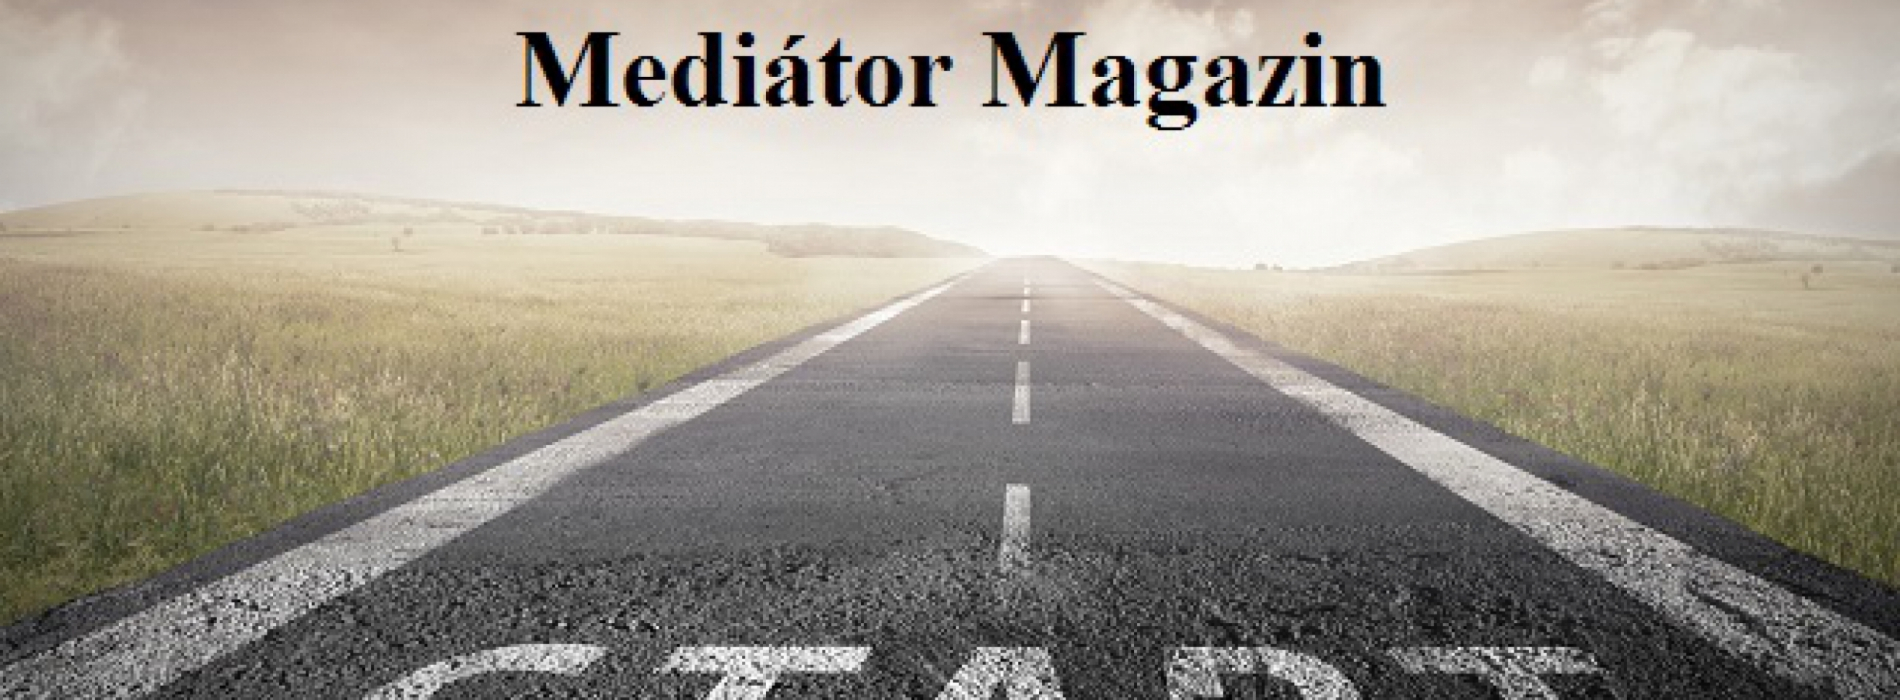 Indul a Mediátor Magazin!